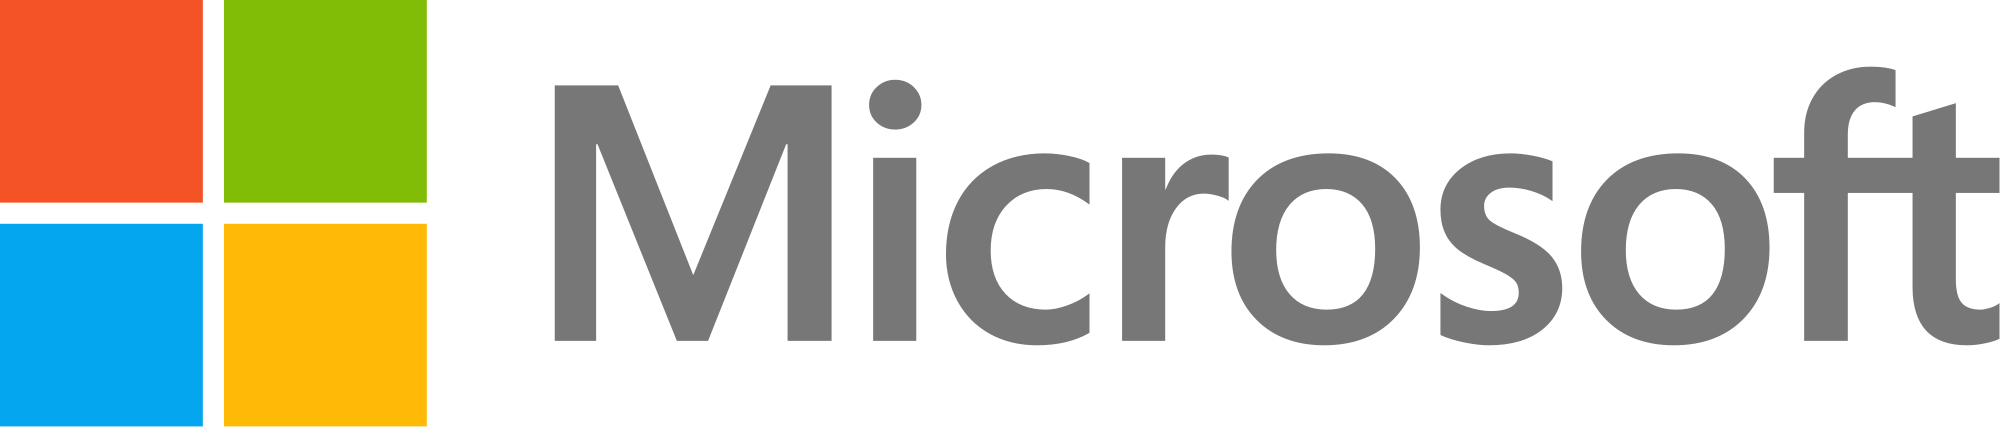 microsoft-logos-png-images-free-download-22